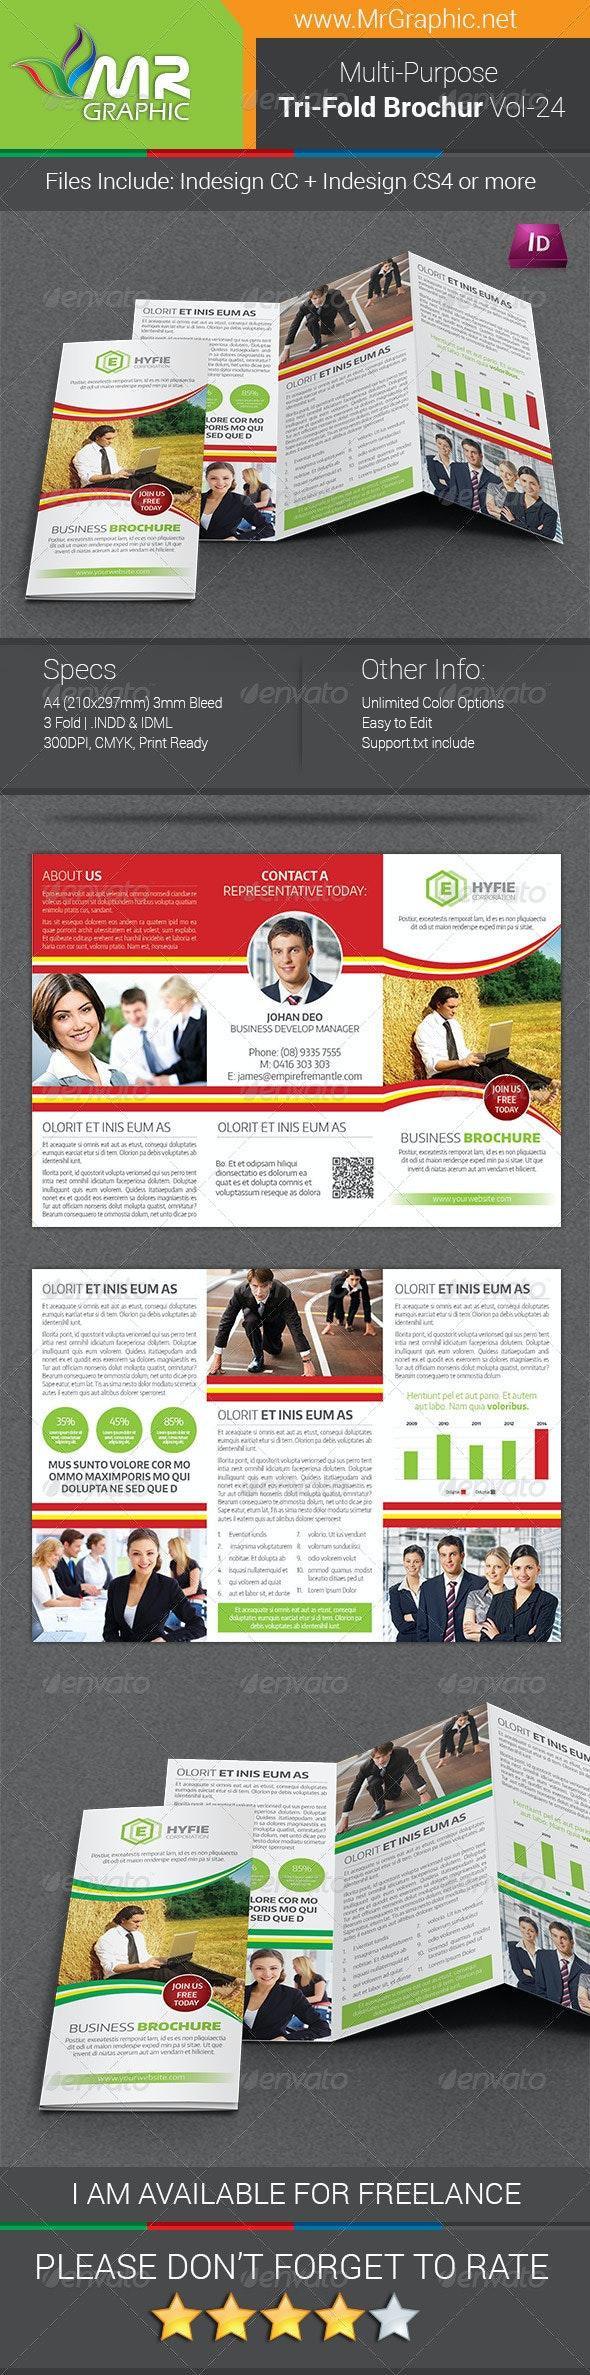 Multipurpose Business Tri-Fold Brochure Vol-24 - Corporate Brochures